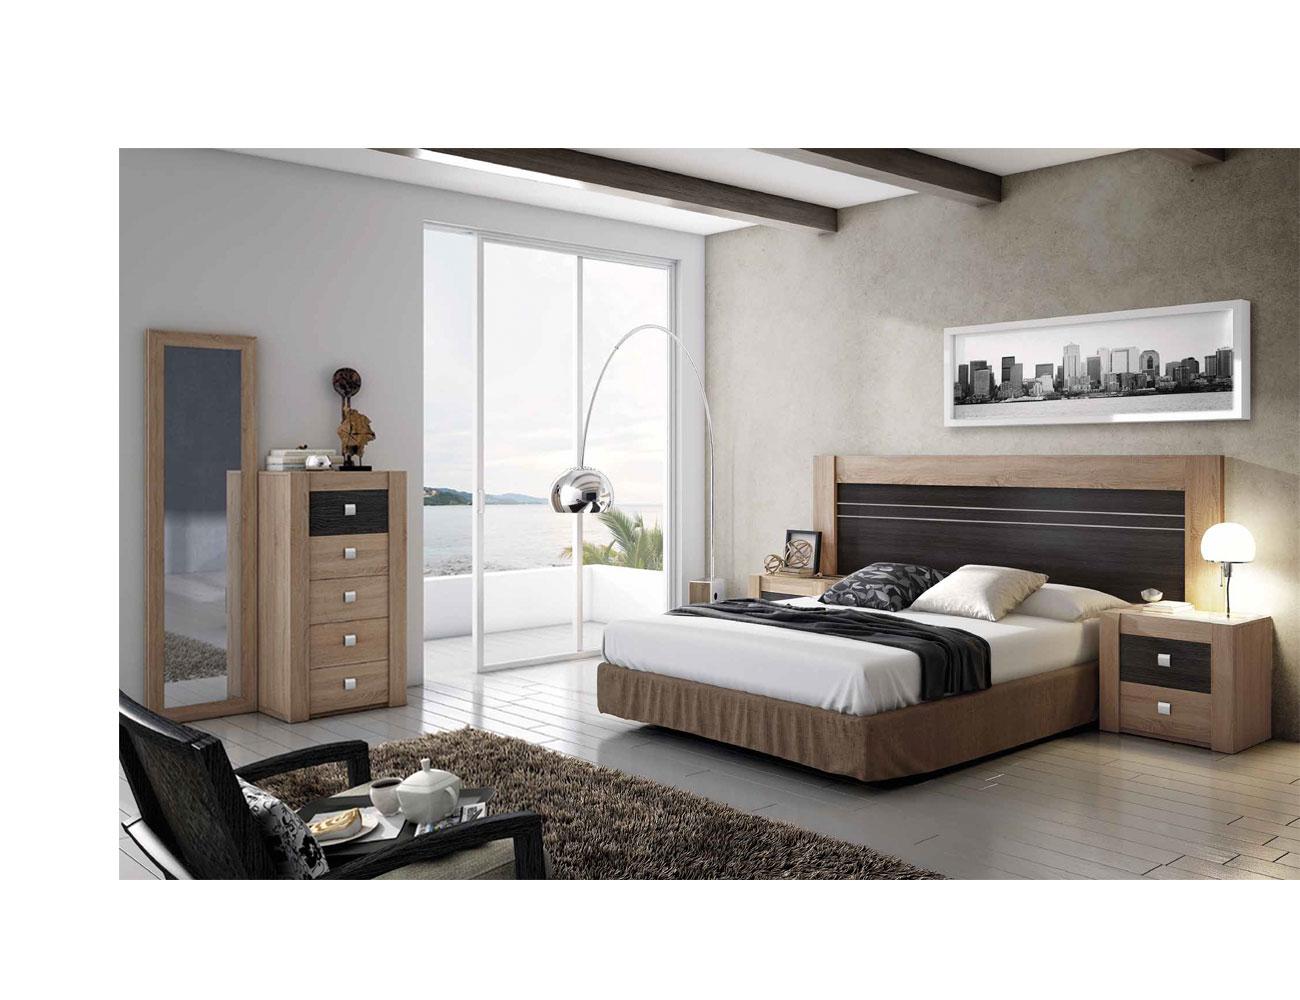 Dormitorio moderno cambrian ceniza 021